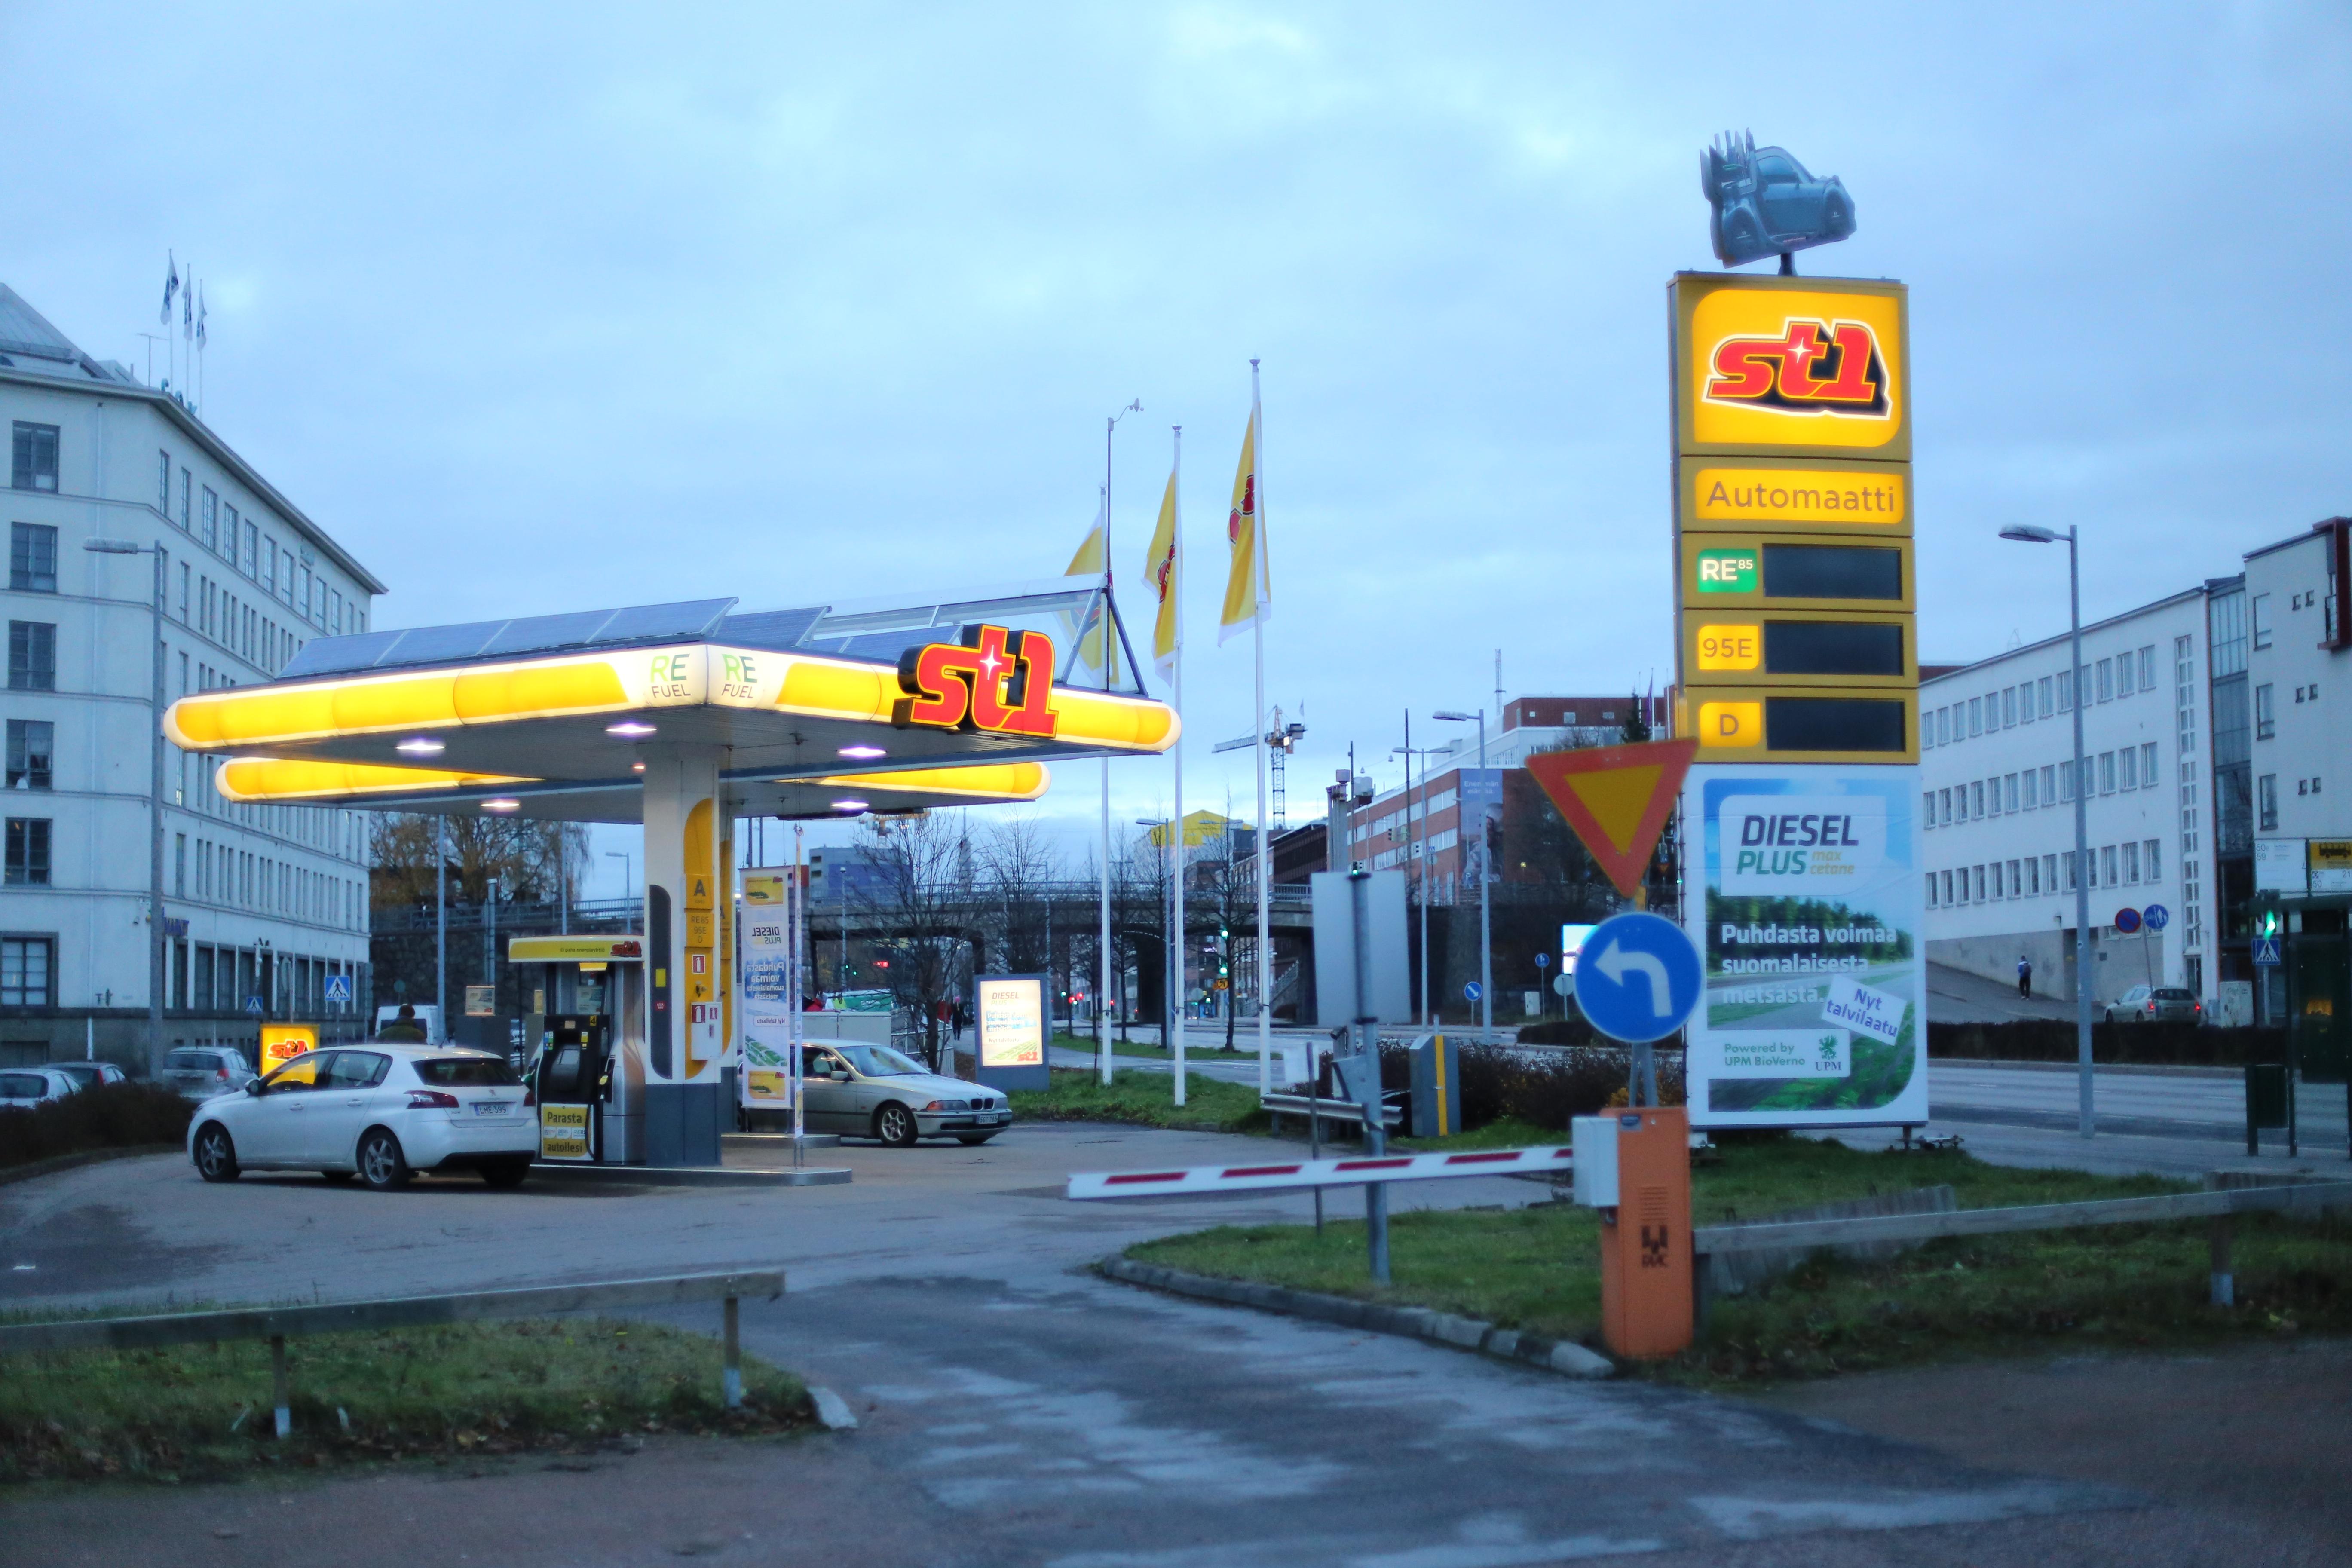 Find Me The Closest Gas Station >> Tiedosto 0667 St1 Gas Station Vallila Helsinki Jpg Wikipedia